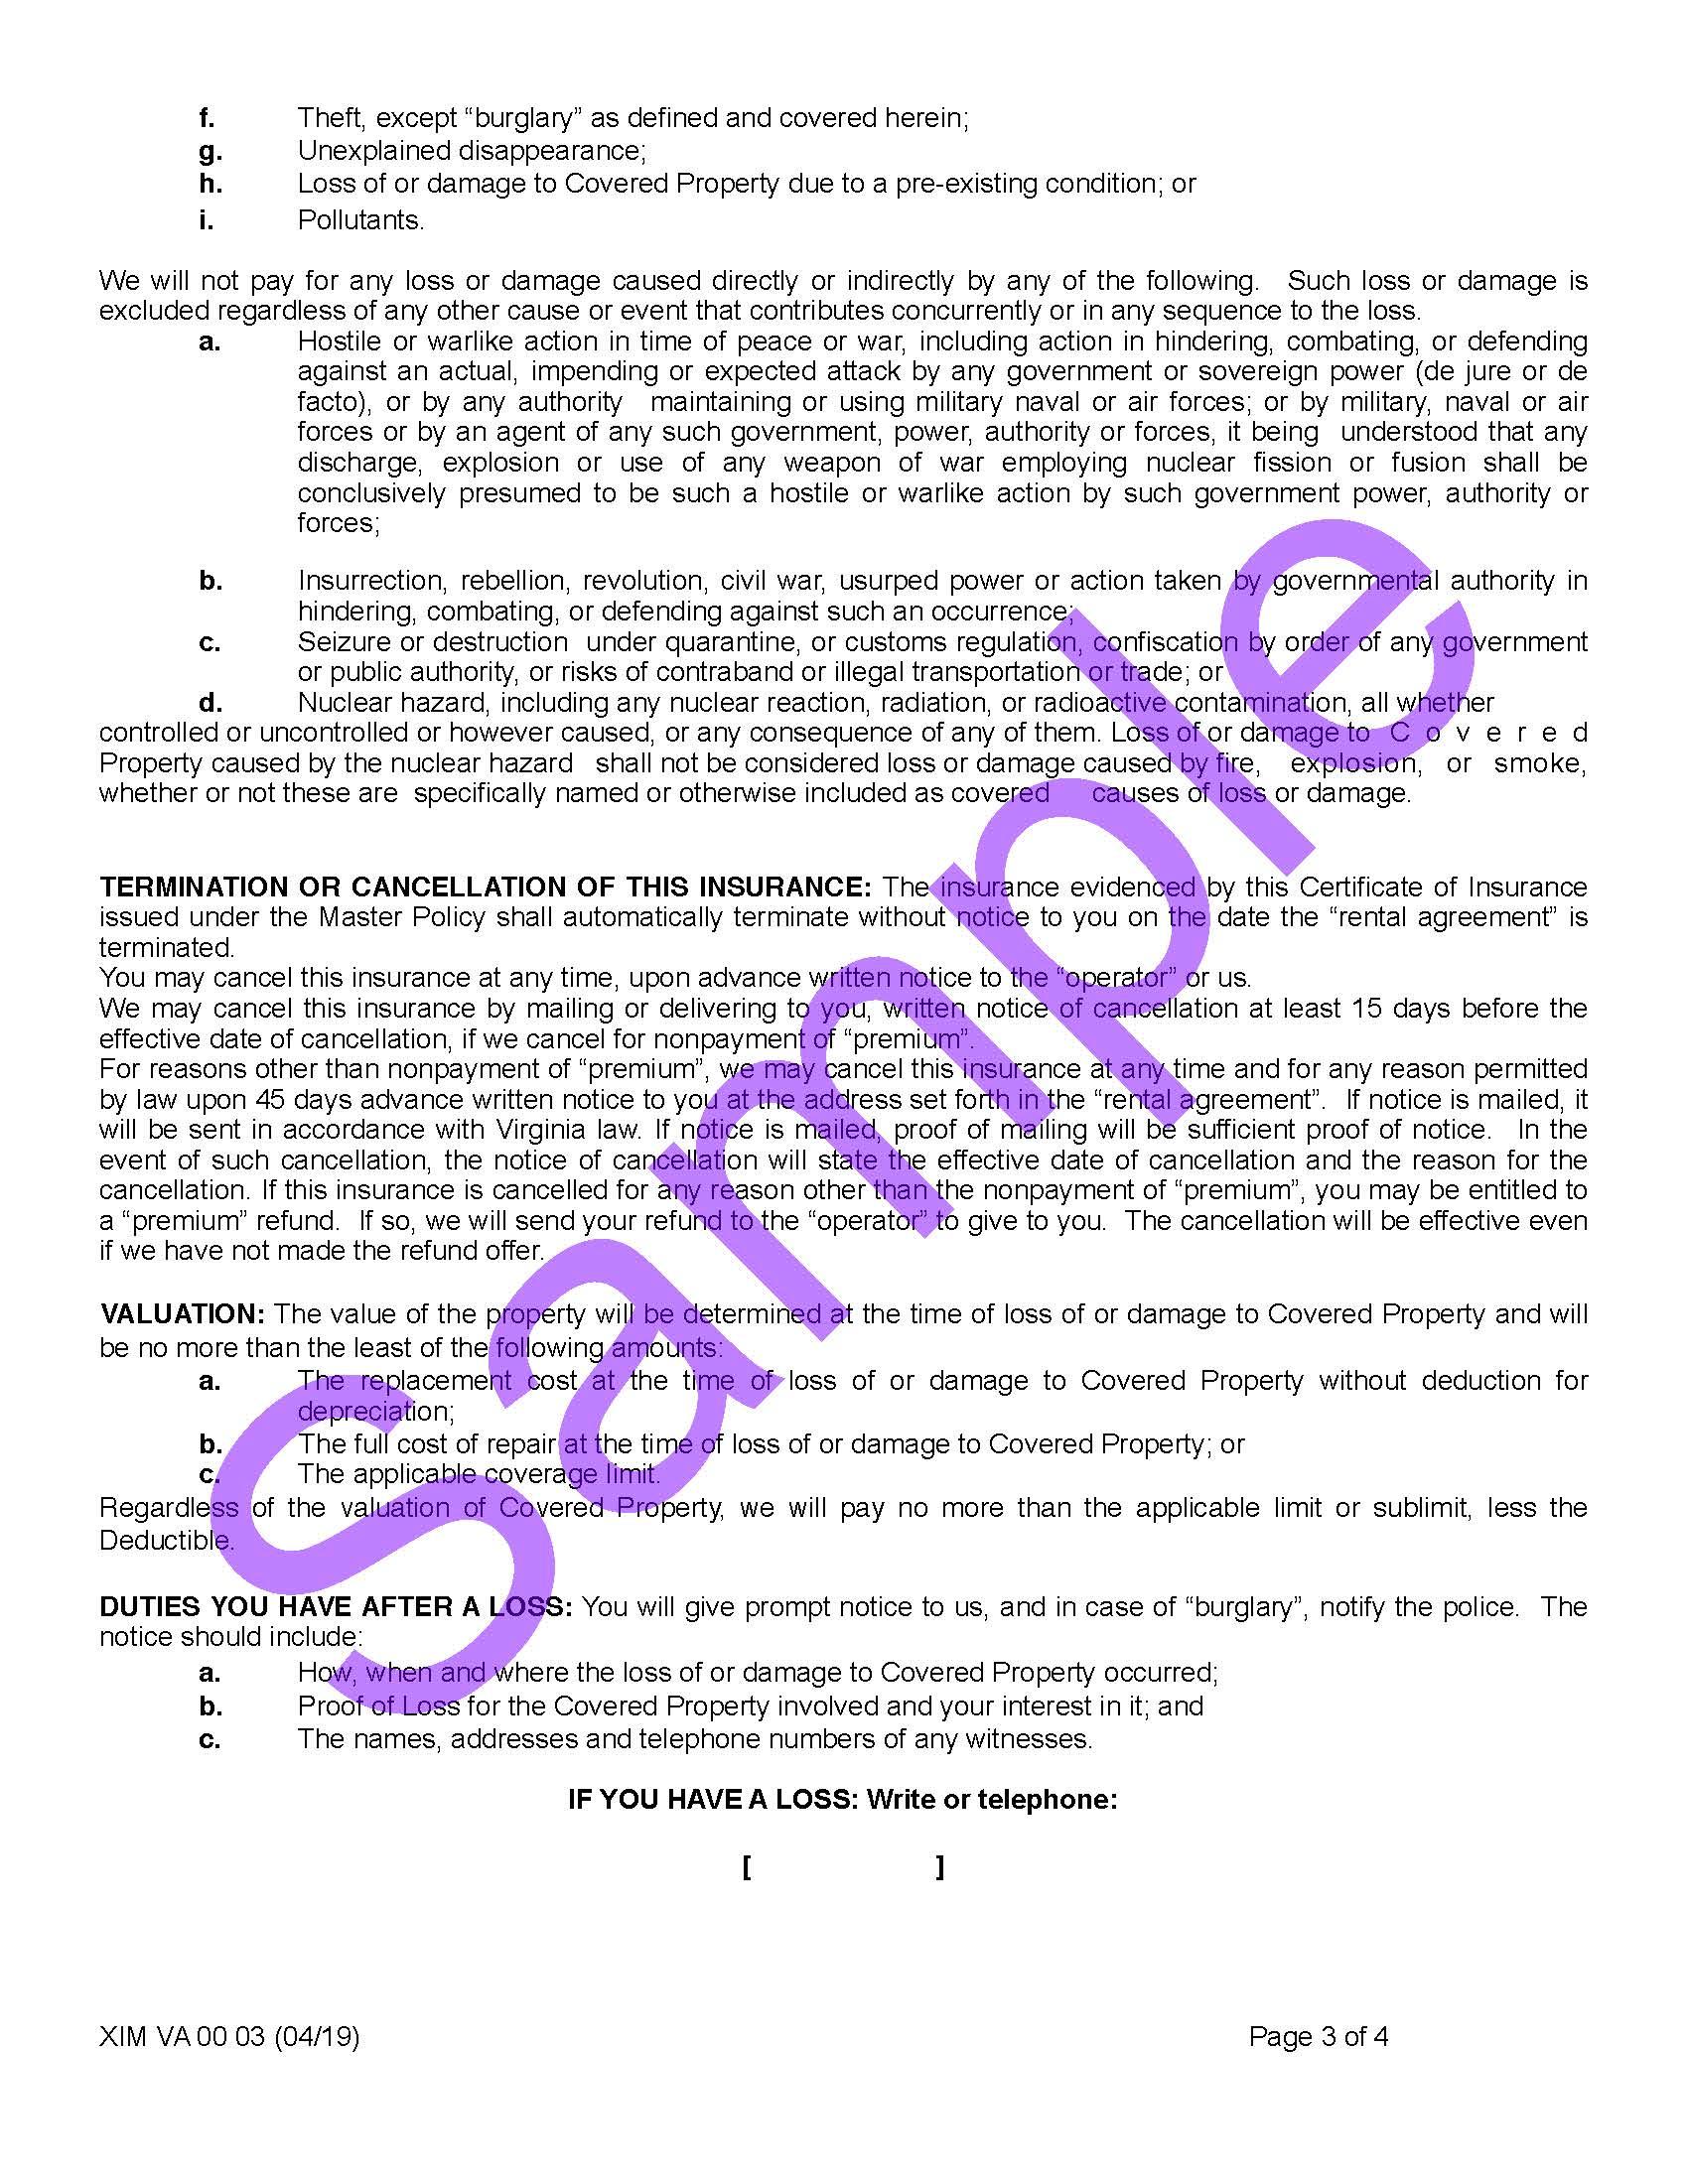 XIM VA 00 03 04 19 Virginia Certificate of InsuranceSample_Page_3.jpg